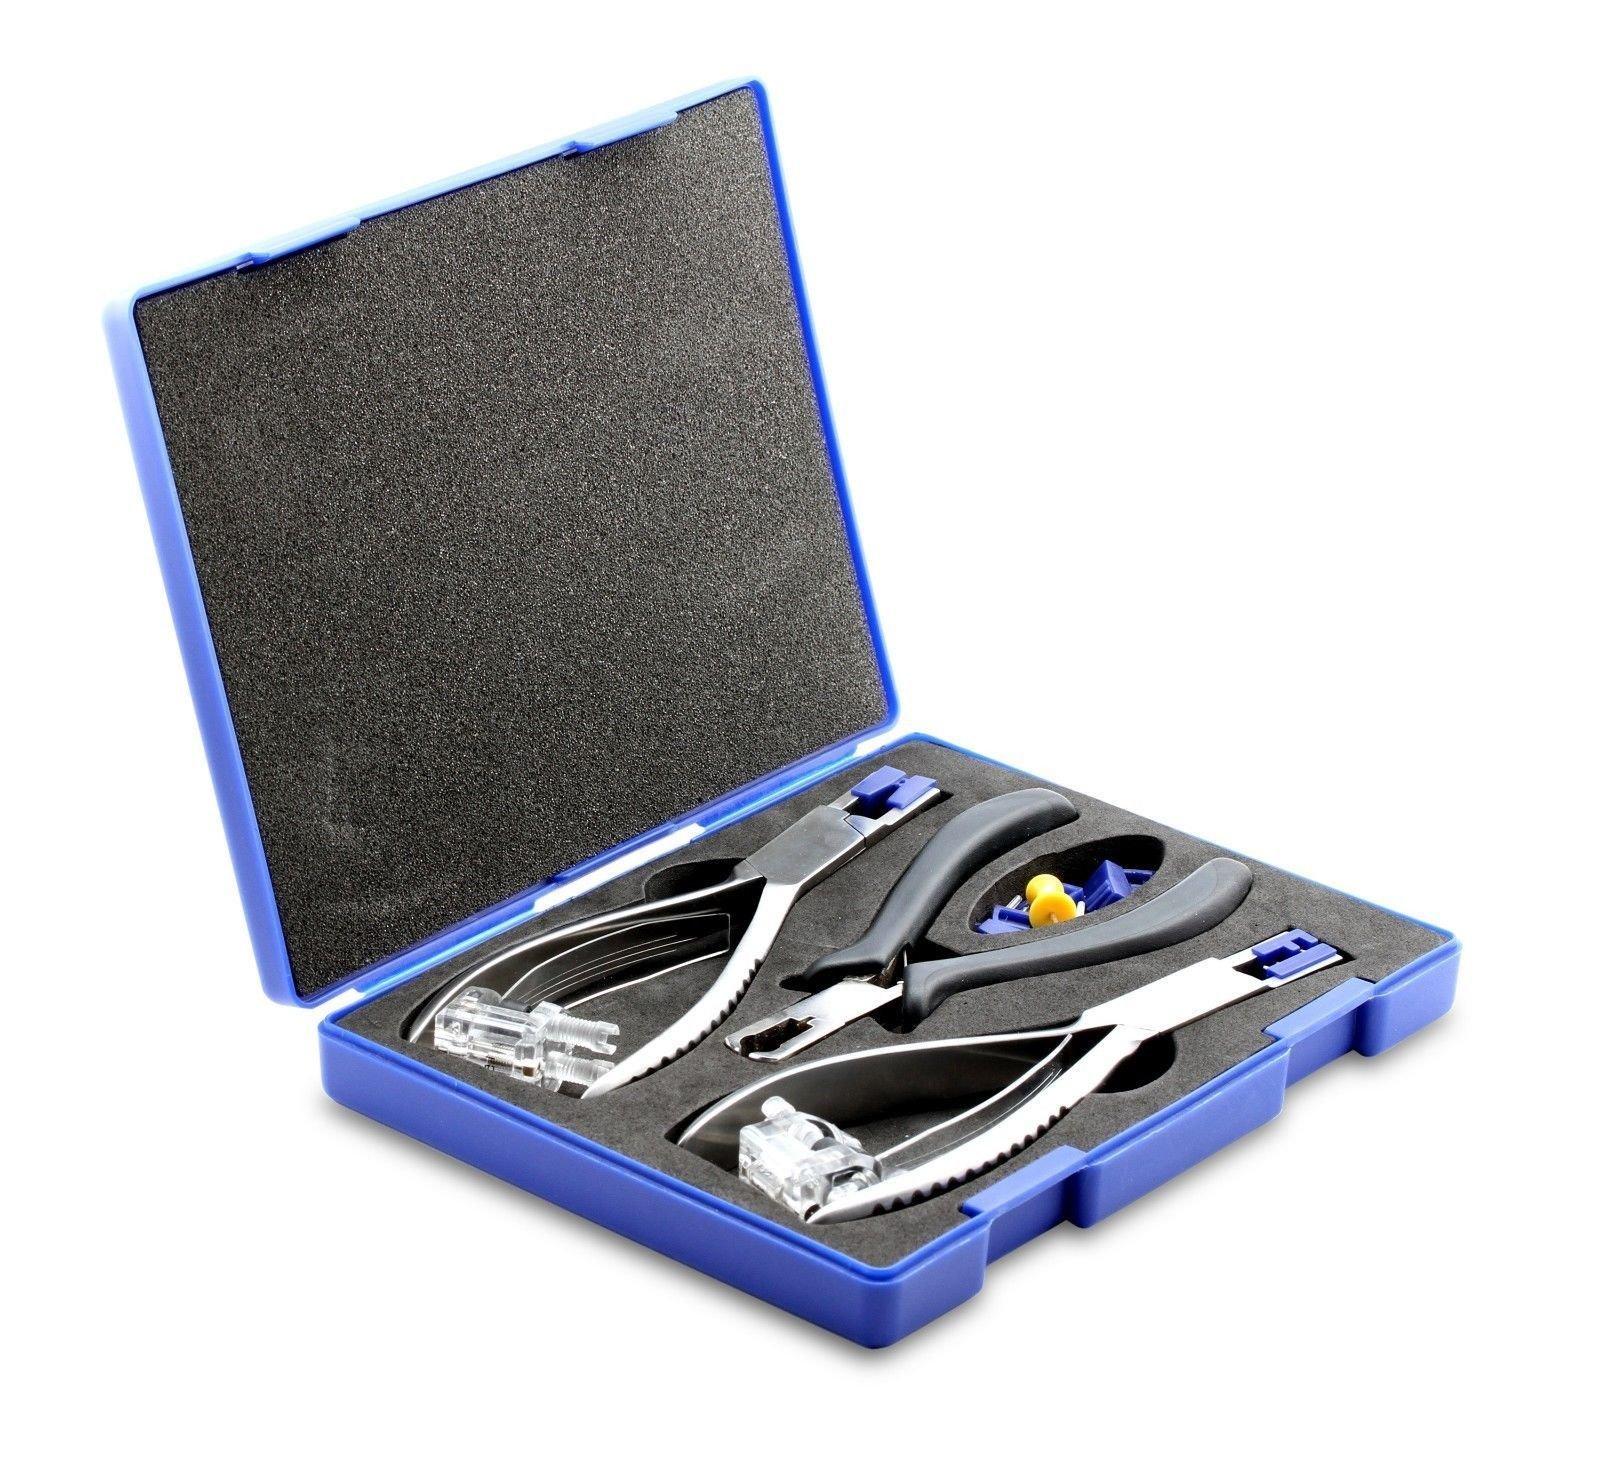 CARESHINE Optical Tools Rimless Disassembly Pliers Set Eyeglass Tool Kit Glasses Plier Rimless Disassembly Glasses Frame Silhousette Eyeglass Plier Set Optical Tool